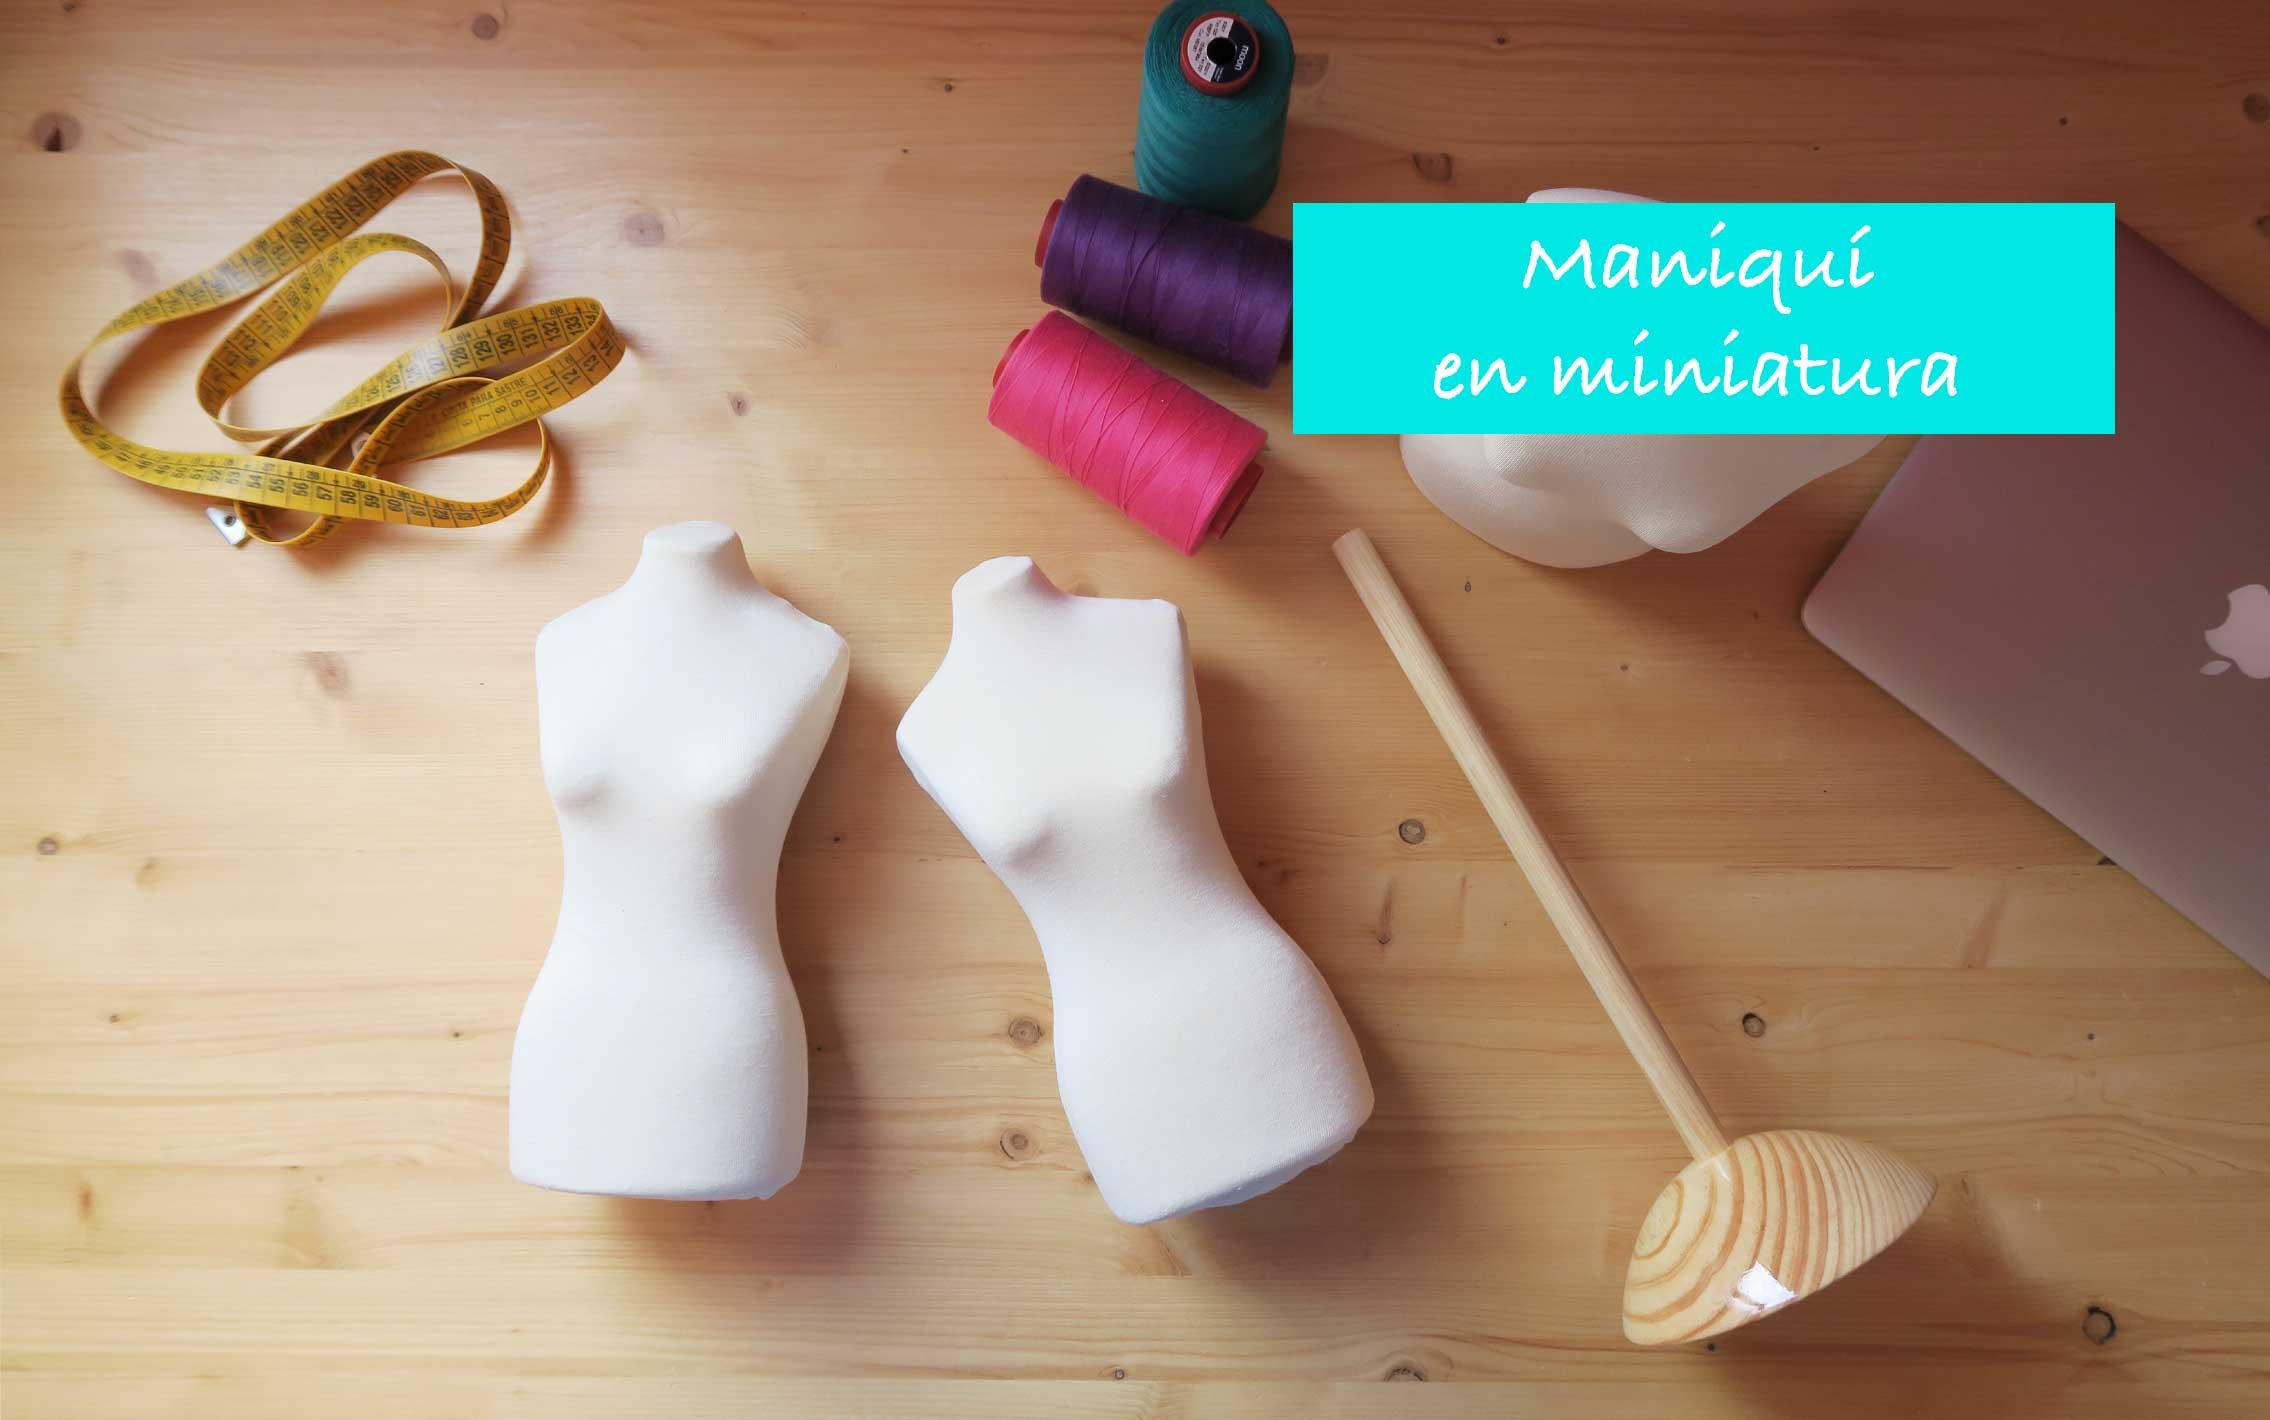 maniqui-en-miniatura-skarlett-costura-carrusel